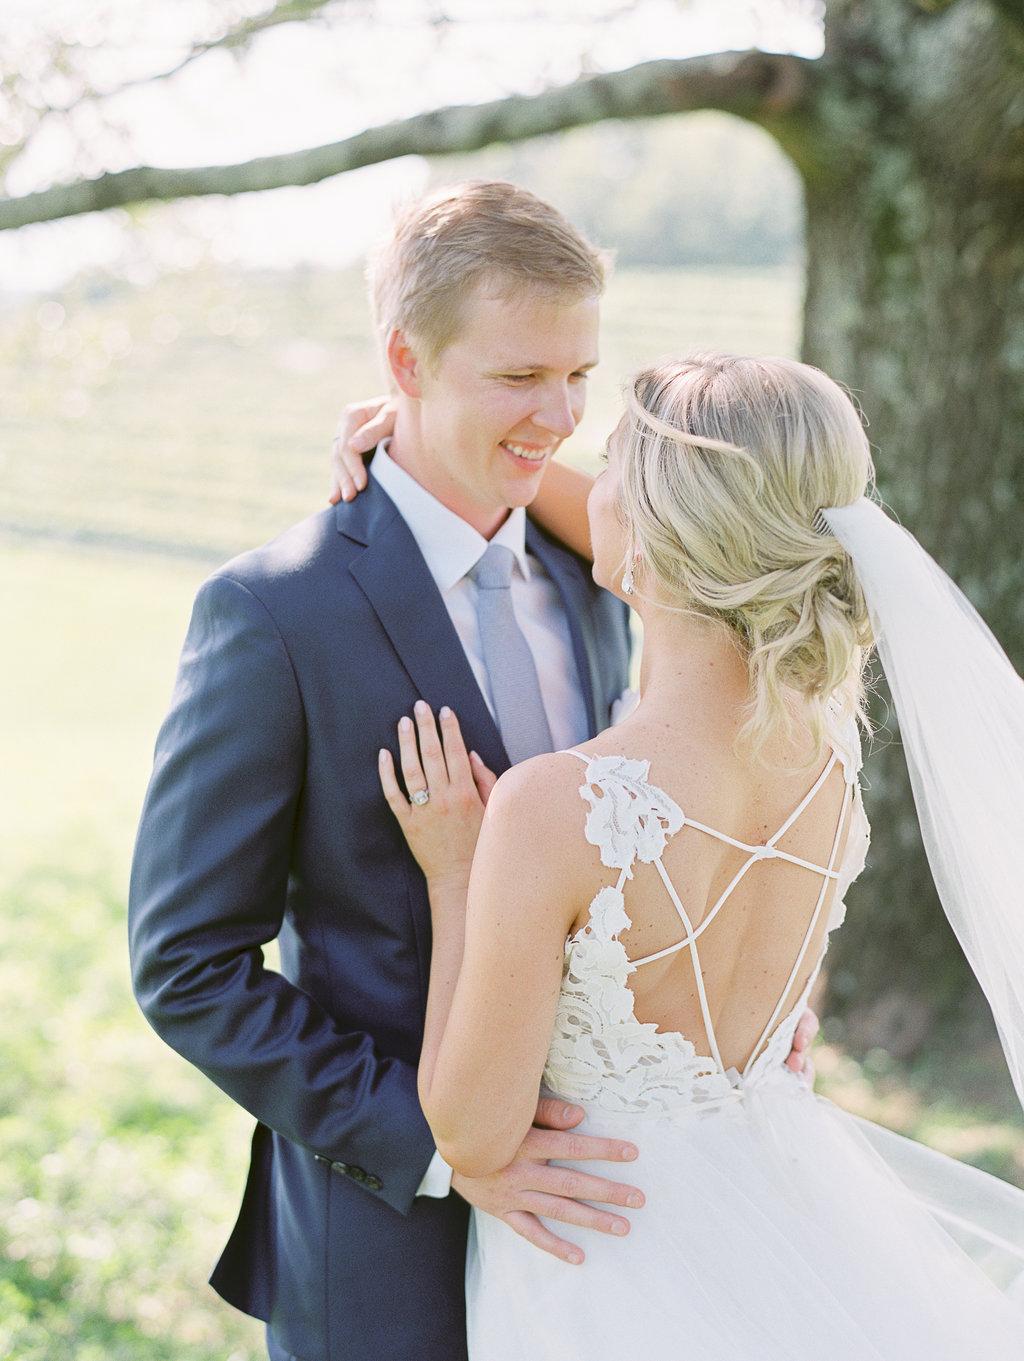 montaluce-winery-dahlonega-atlanta-wedding-photographer-fine-art-film-hannah-forsberg19.JPG